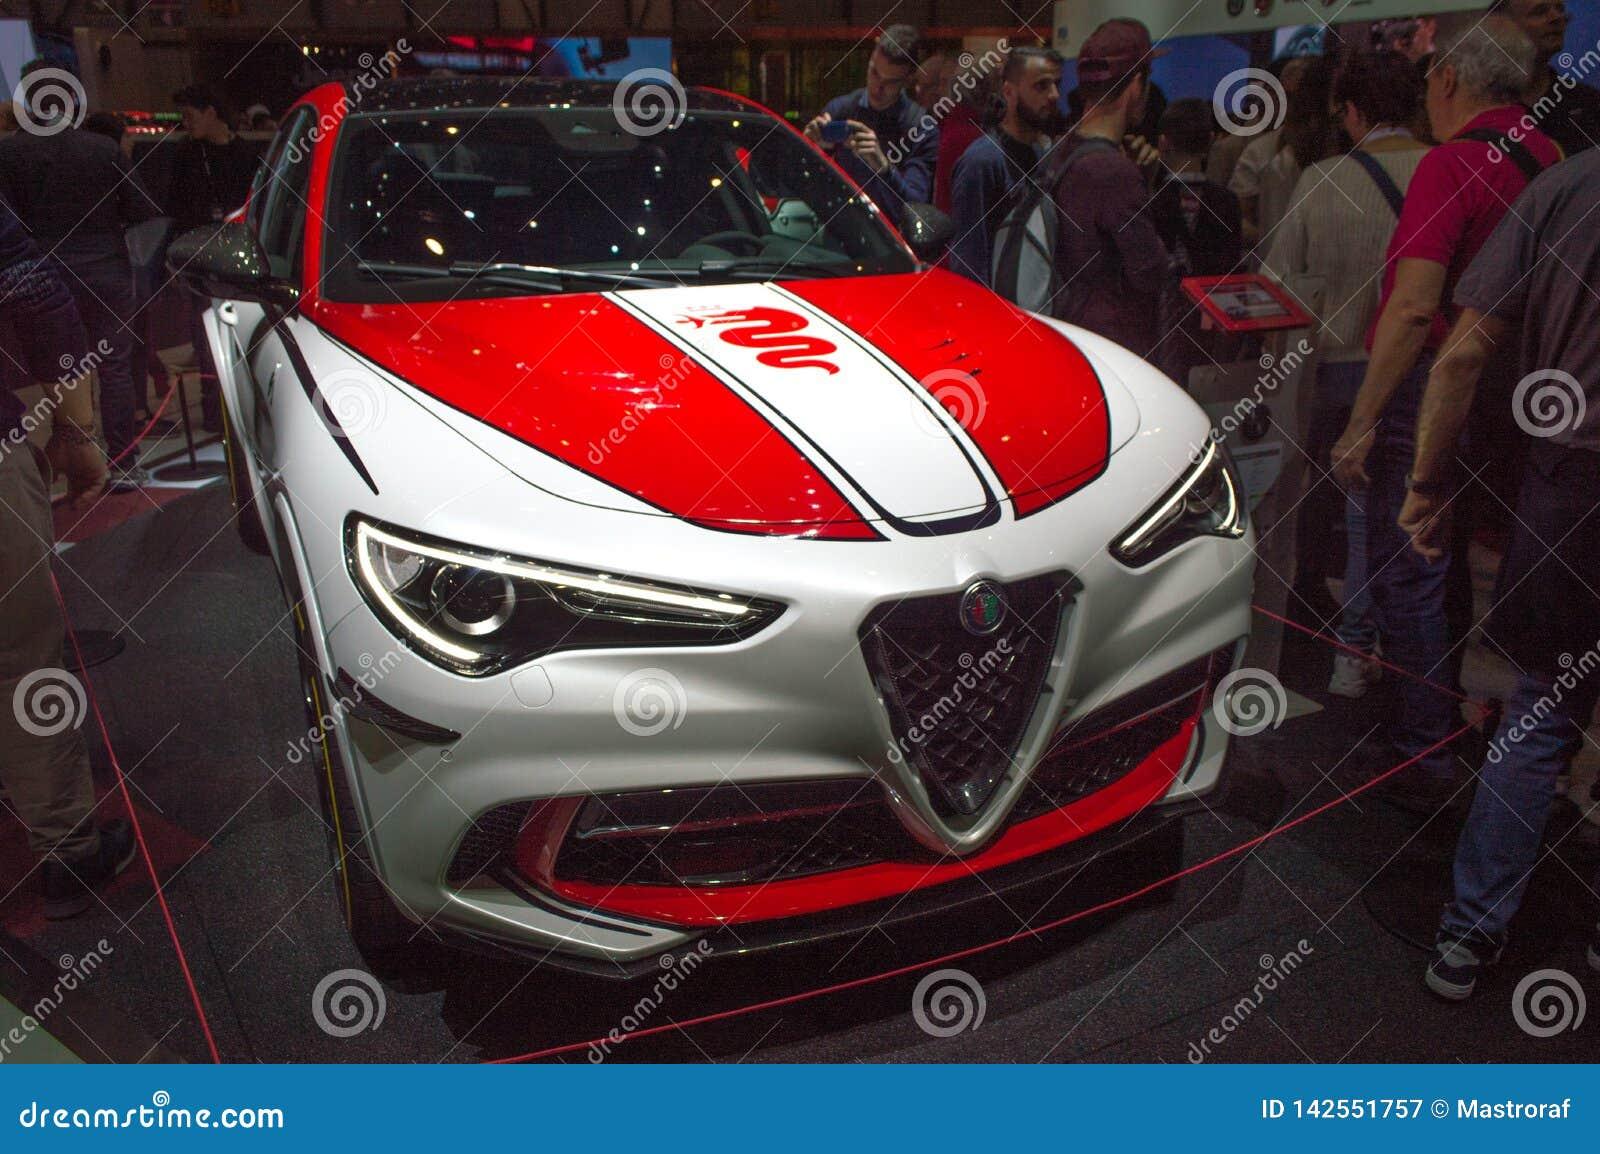 Alfa Romeo Stelvio At Geneva 2019 Editorial Photography Image Of Salon Powerful 142551757